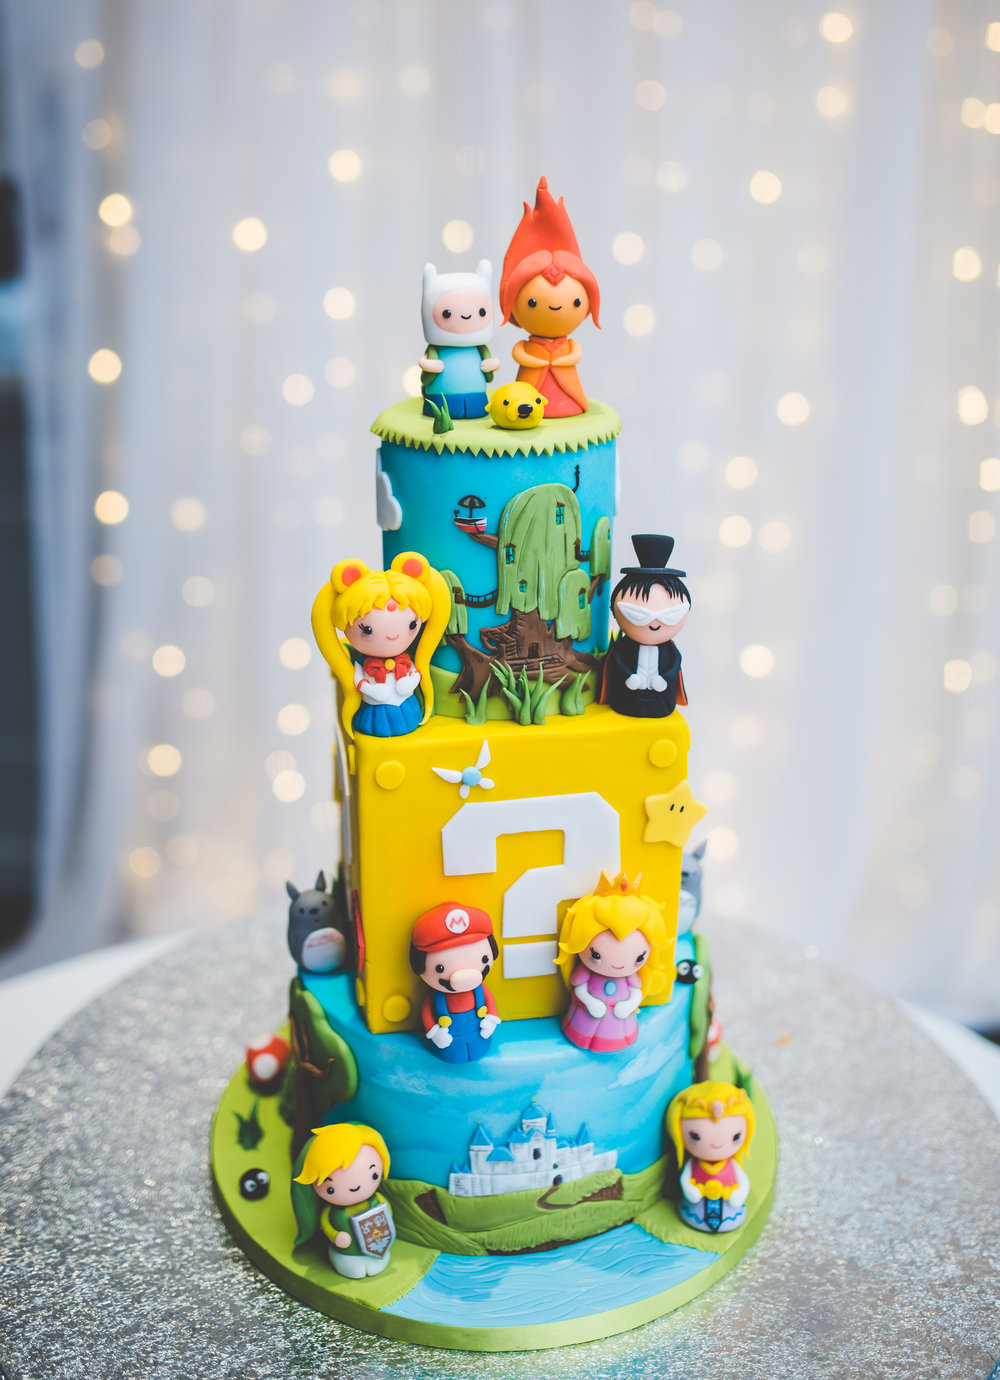 Retro game wedding cake- lancashire wedding